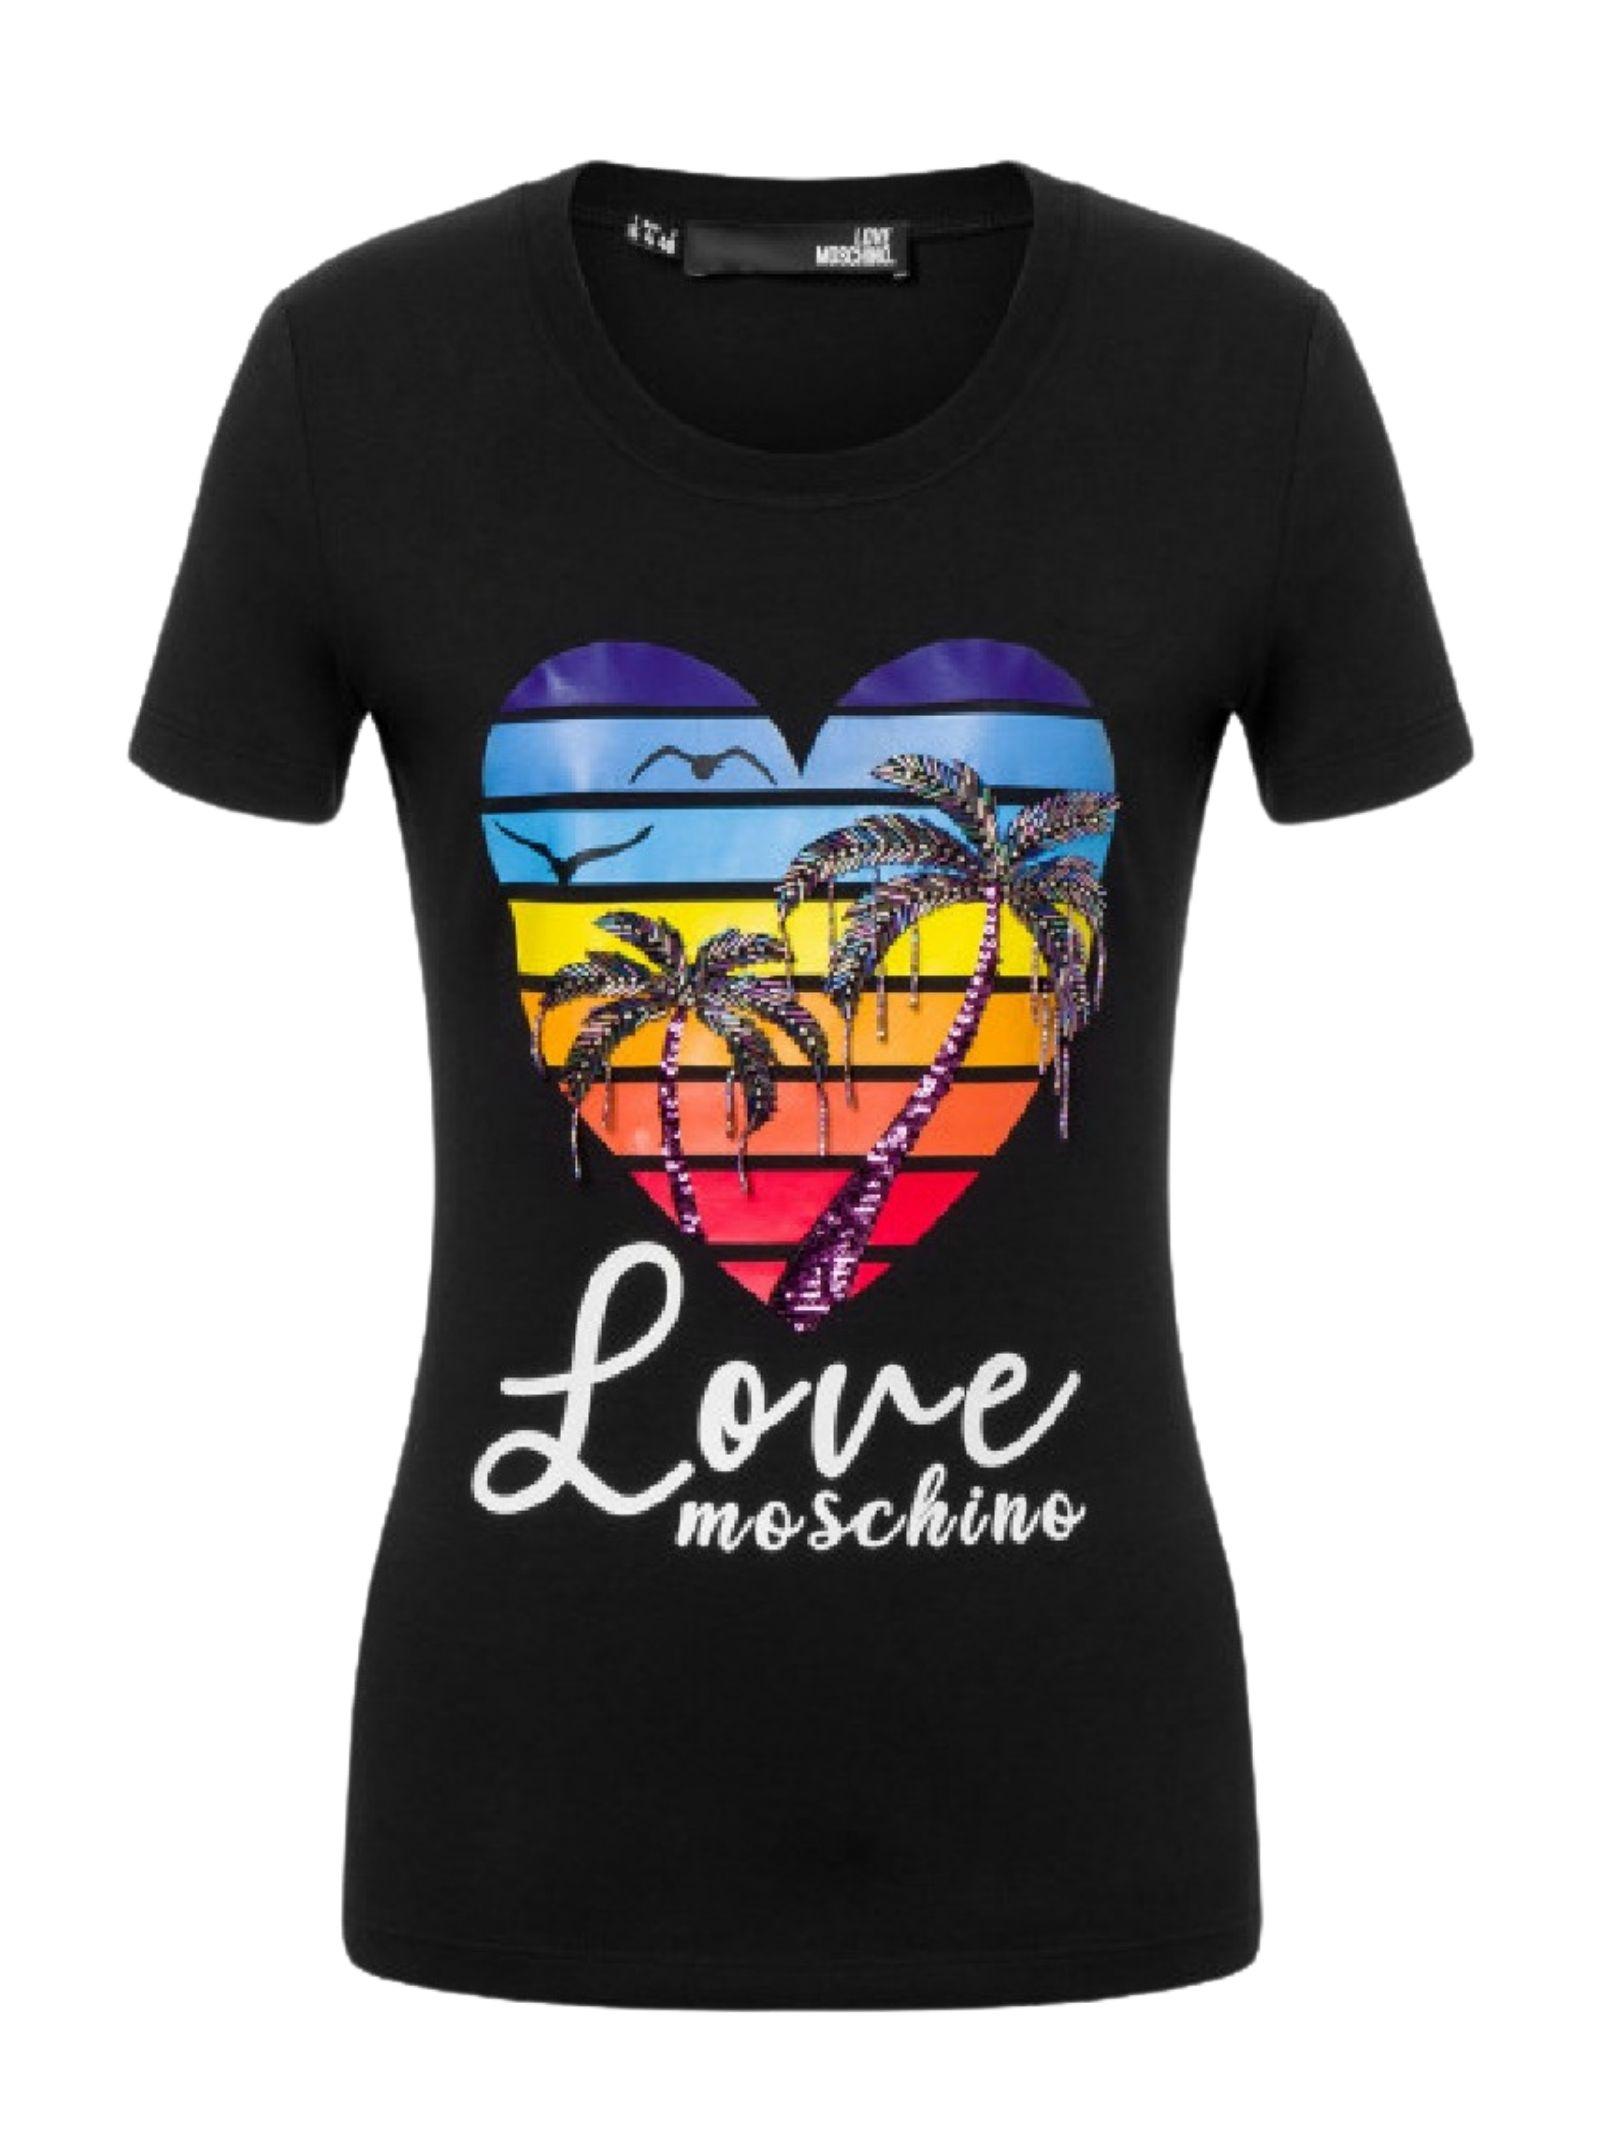 MOSCHINO LOVE   T-shirt   W 4 H19 08 E 1951C74